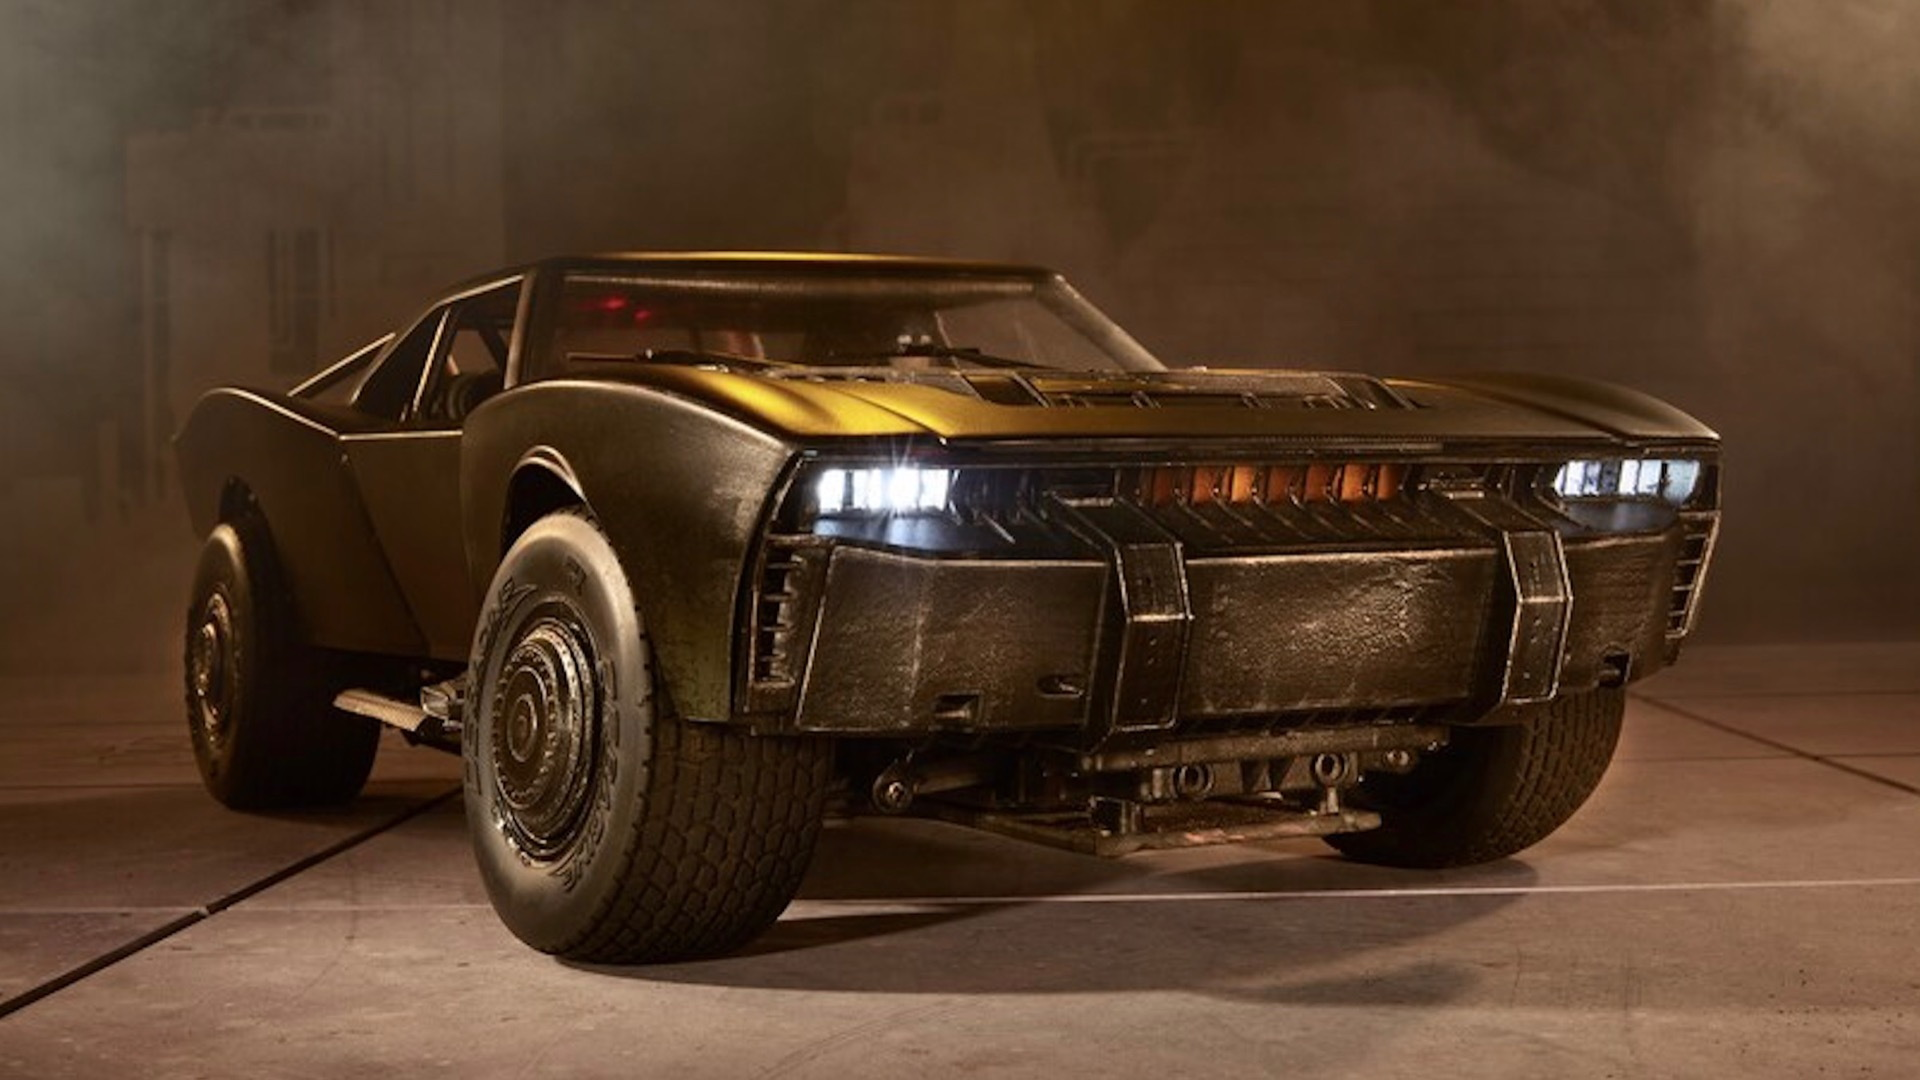 """The Batman"" Hot Wheels RC Batmobile"